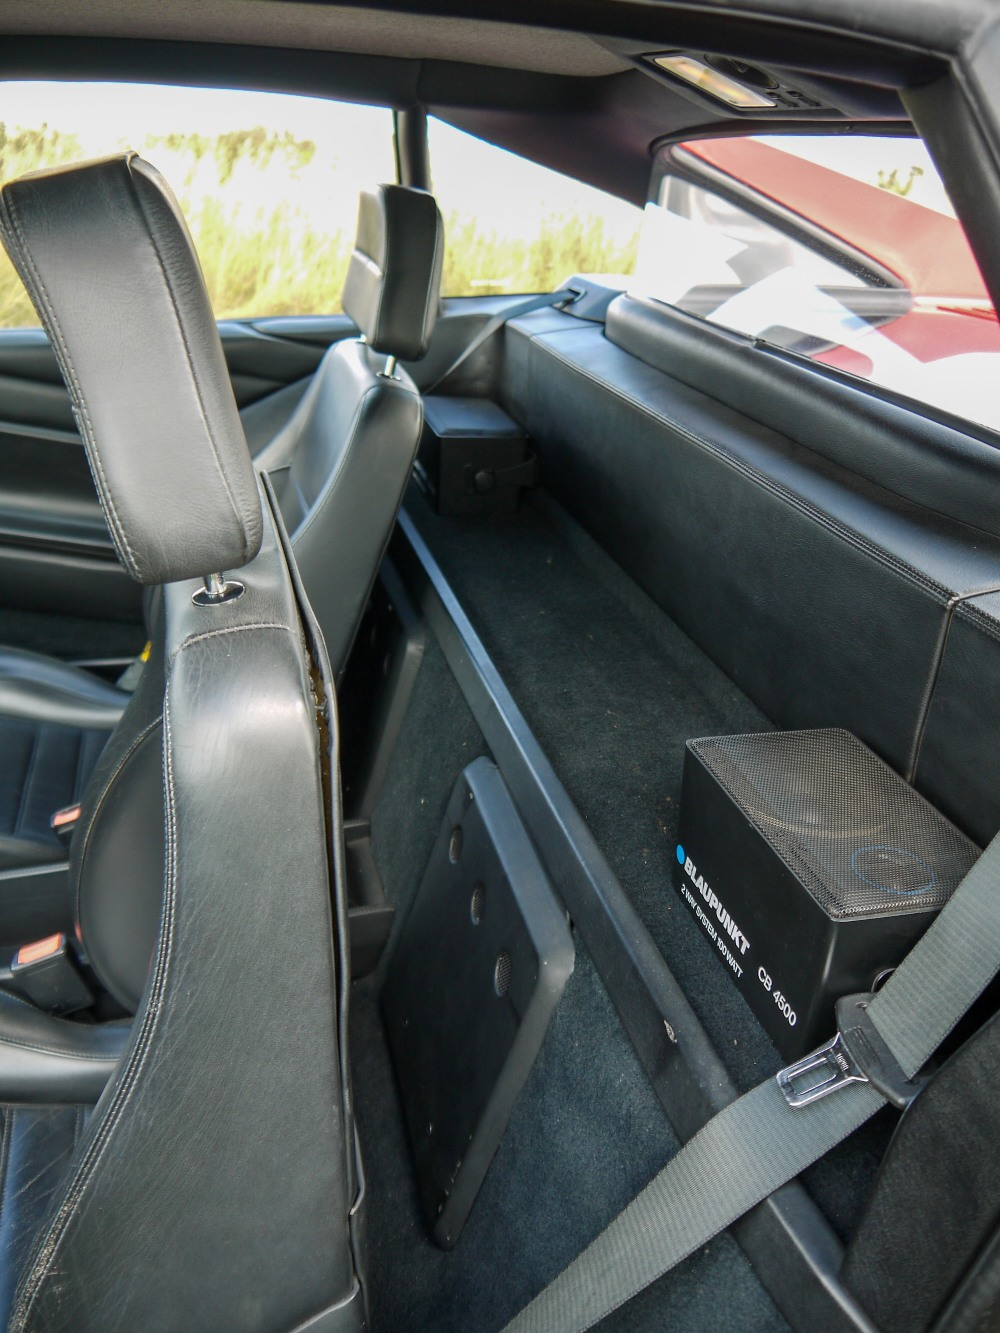 1993 FERRARI 348 TRASVERSALE BERLINETTA Registration Number: L796THC Chassis Number: - Image 26 of 49